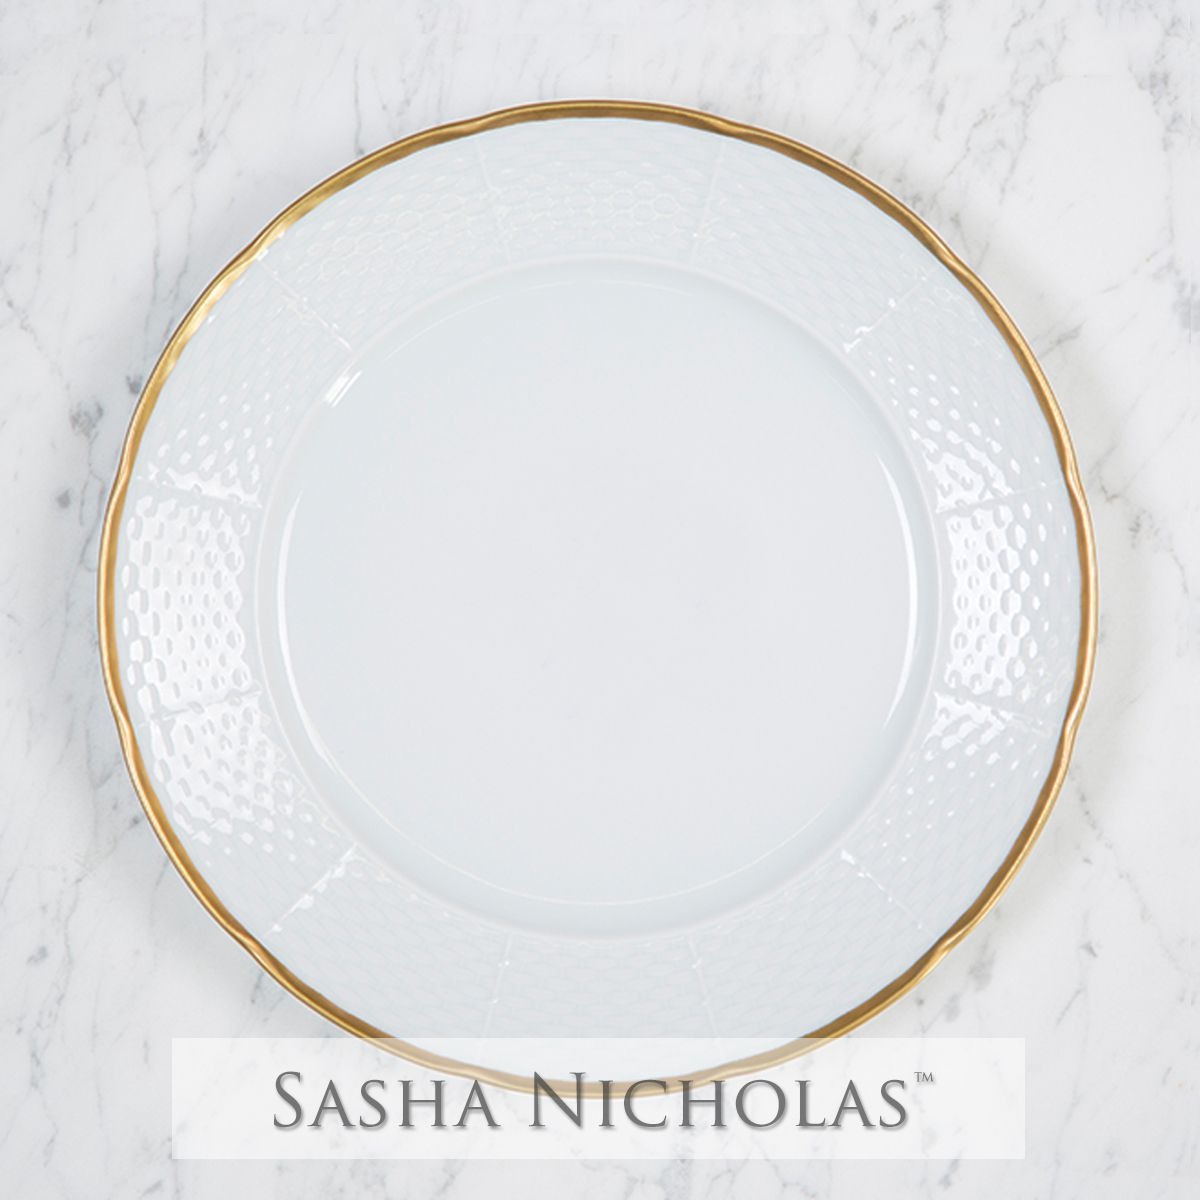 Weave Simply White 24k Gold Dinner Plate